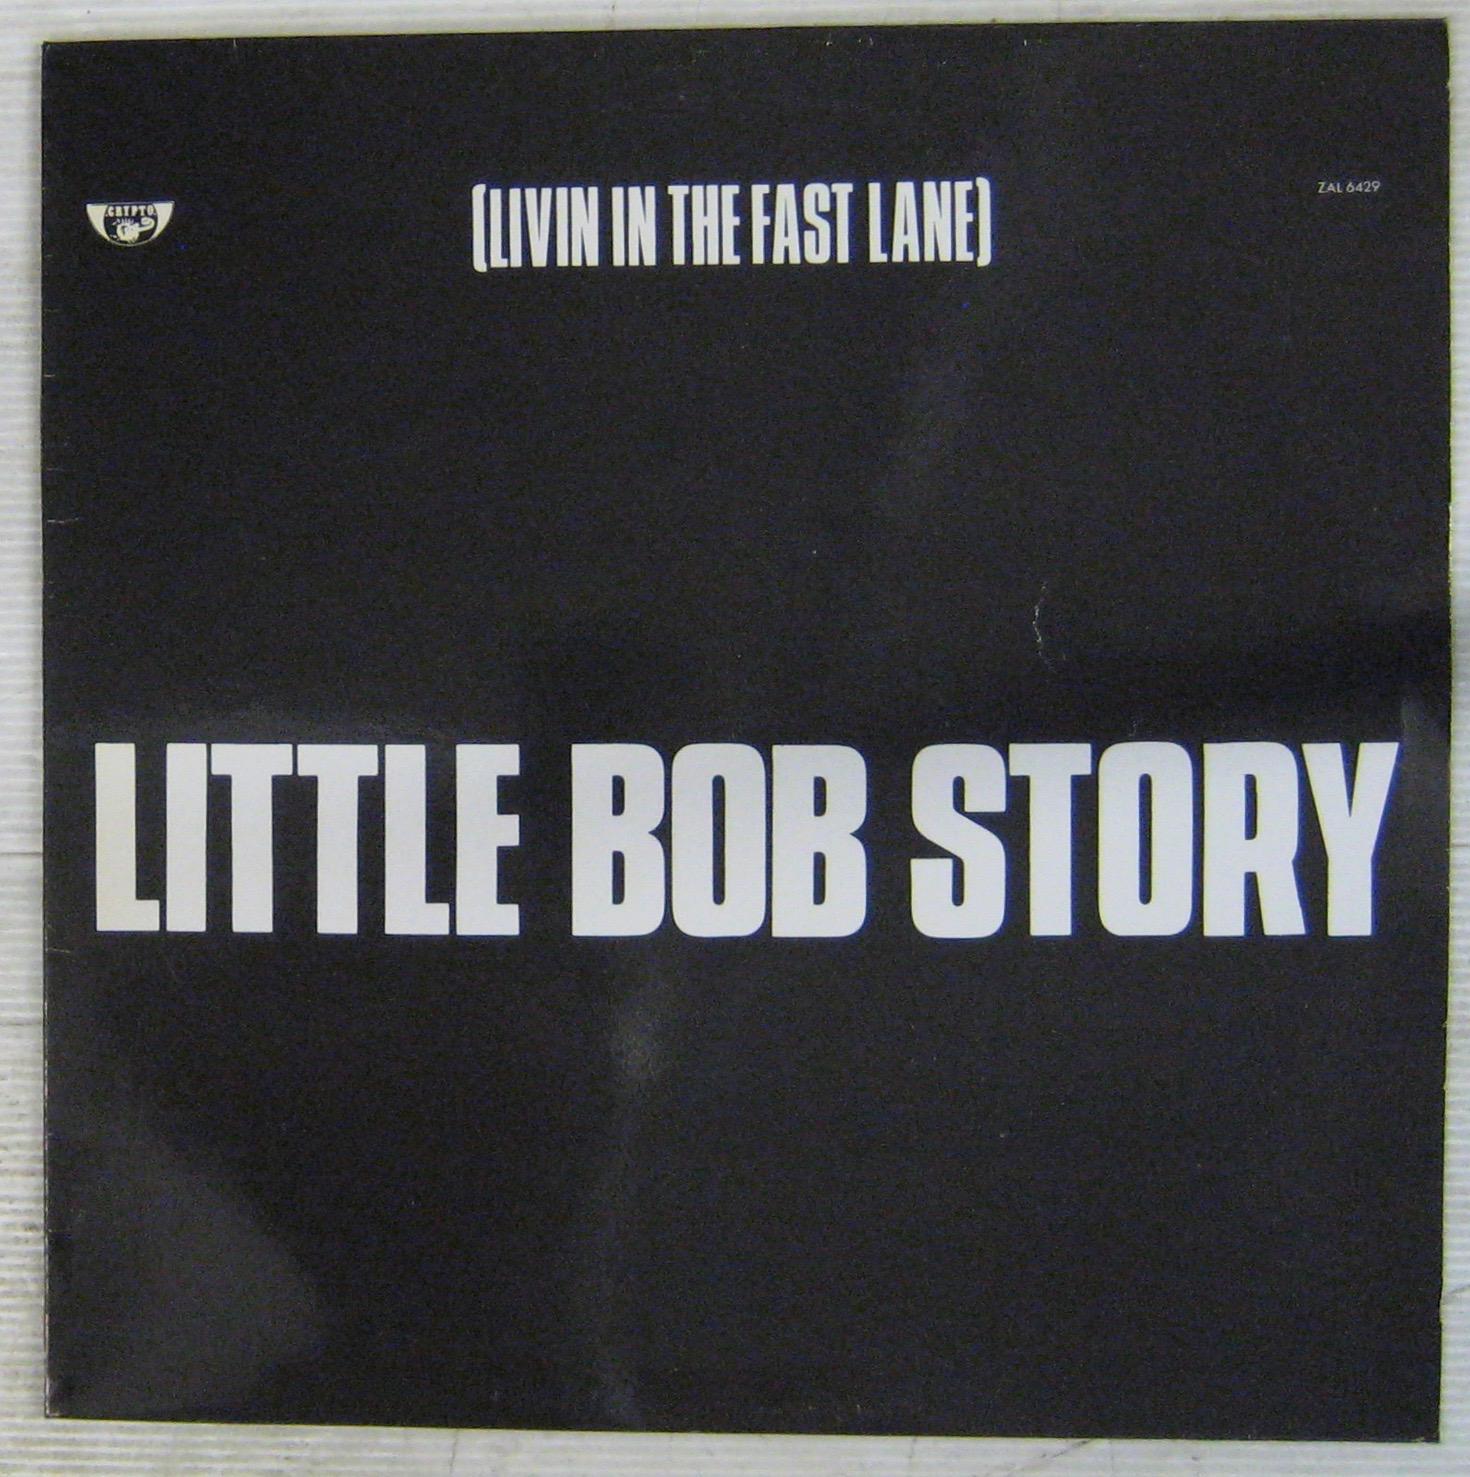 LITTLE BOB STORY - Livin' in the fast lane - 33T